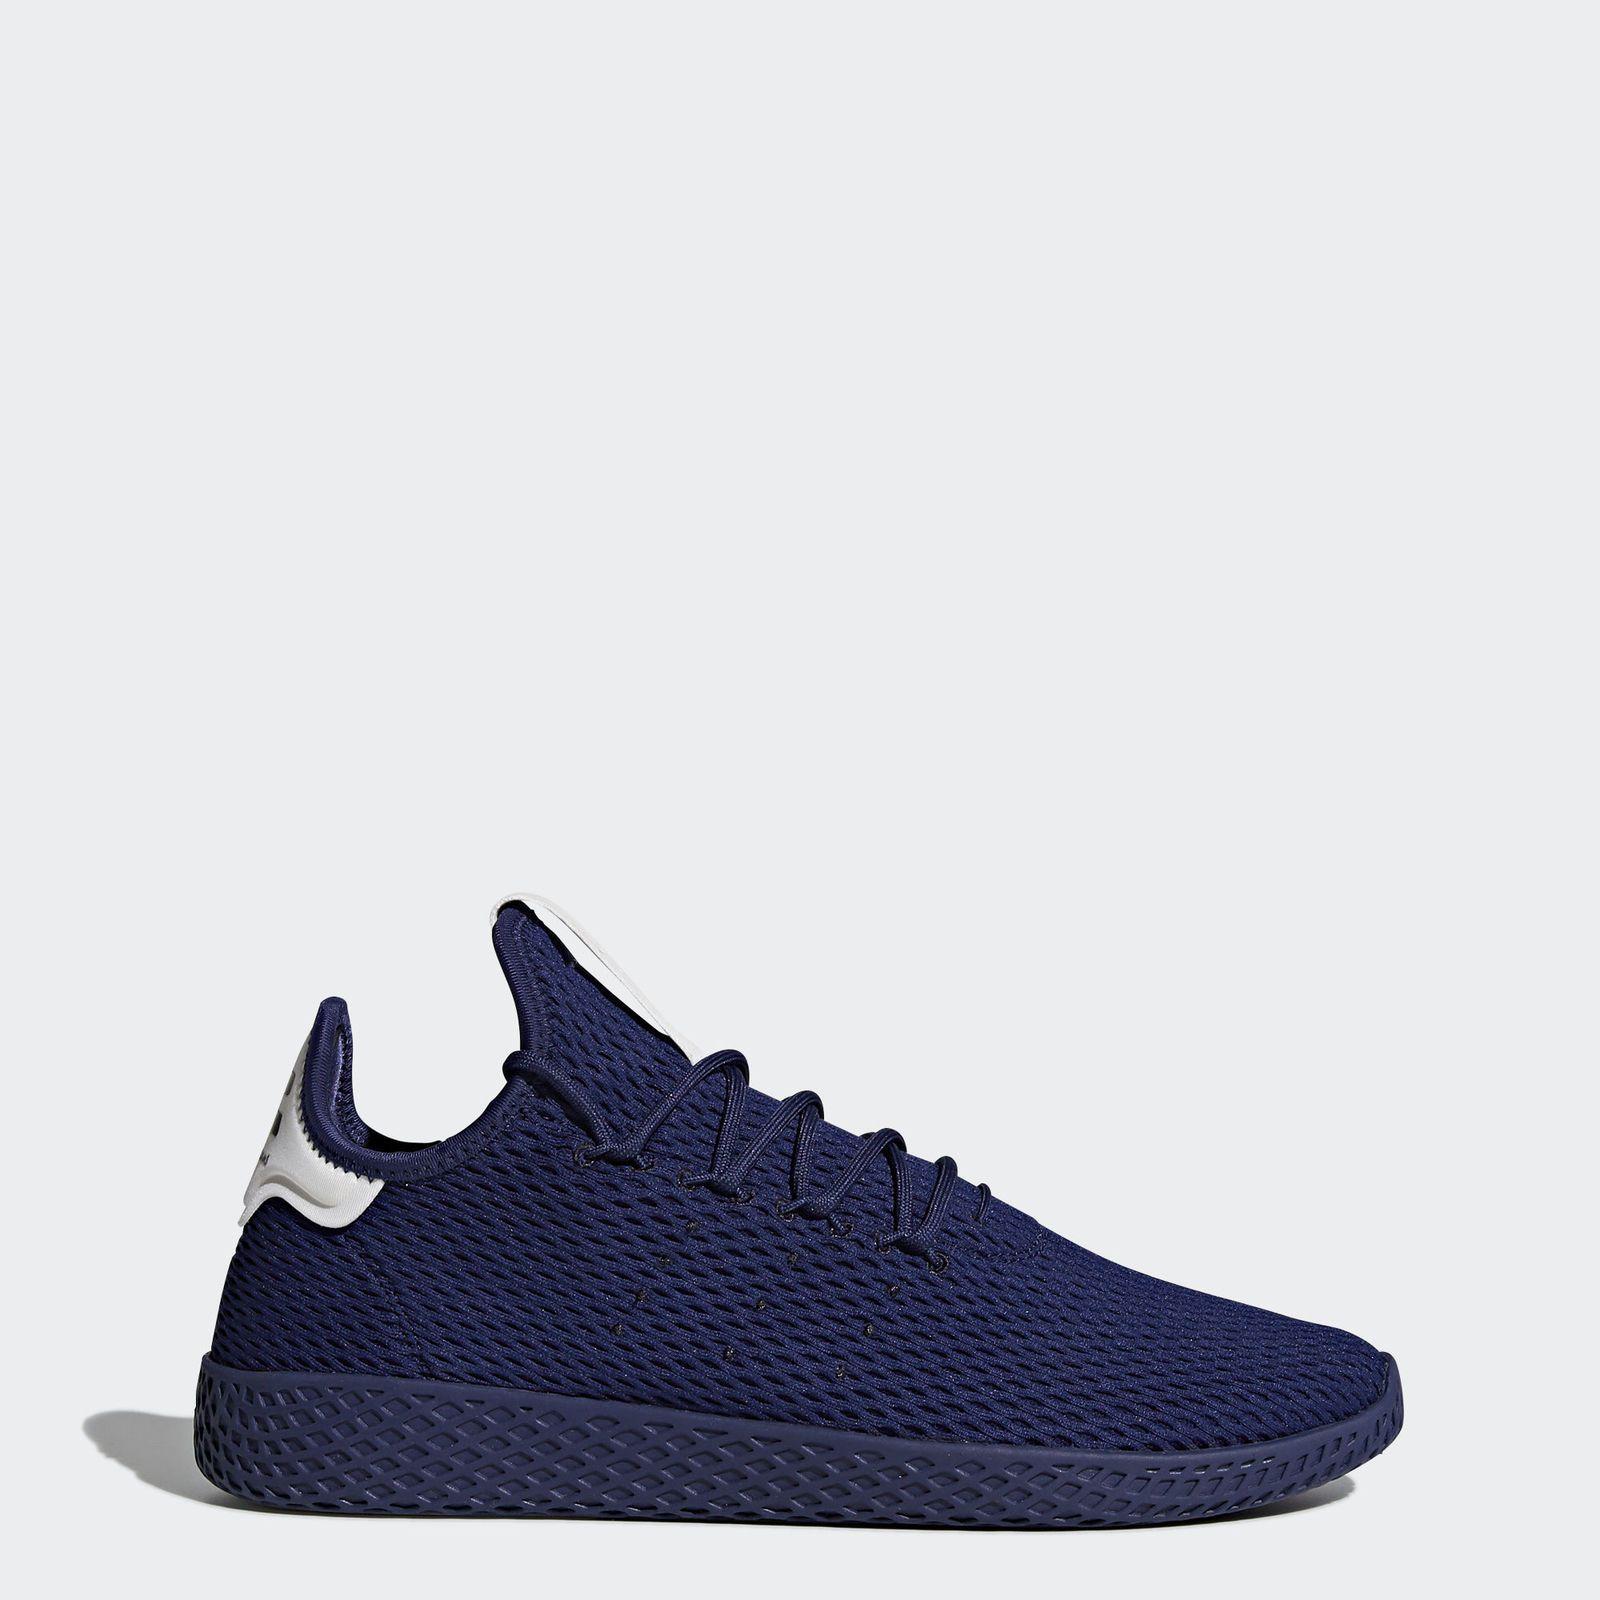 Adidas Pharrell hombre Williams Tennis Hu zapatos hombre Pharrell Shopping cb30f4